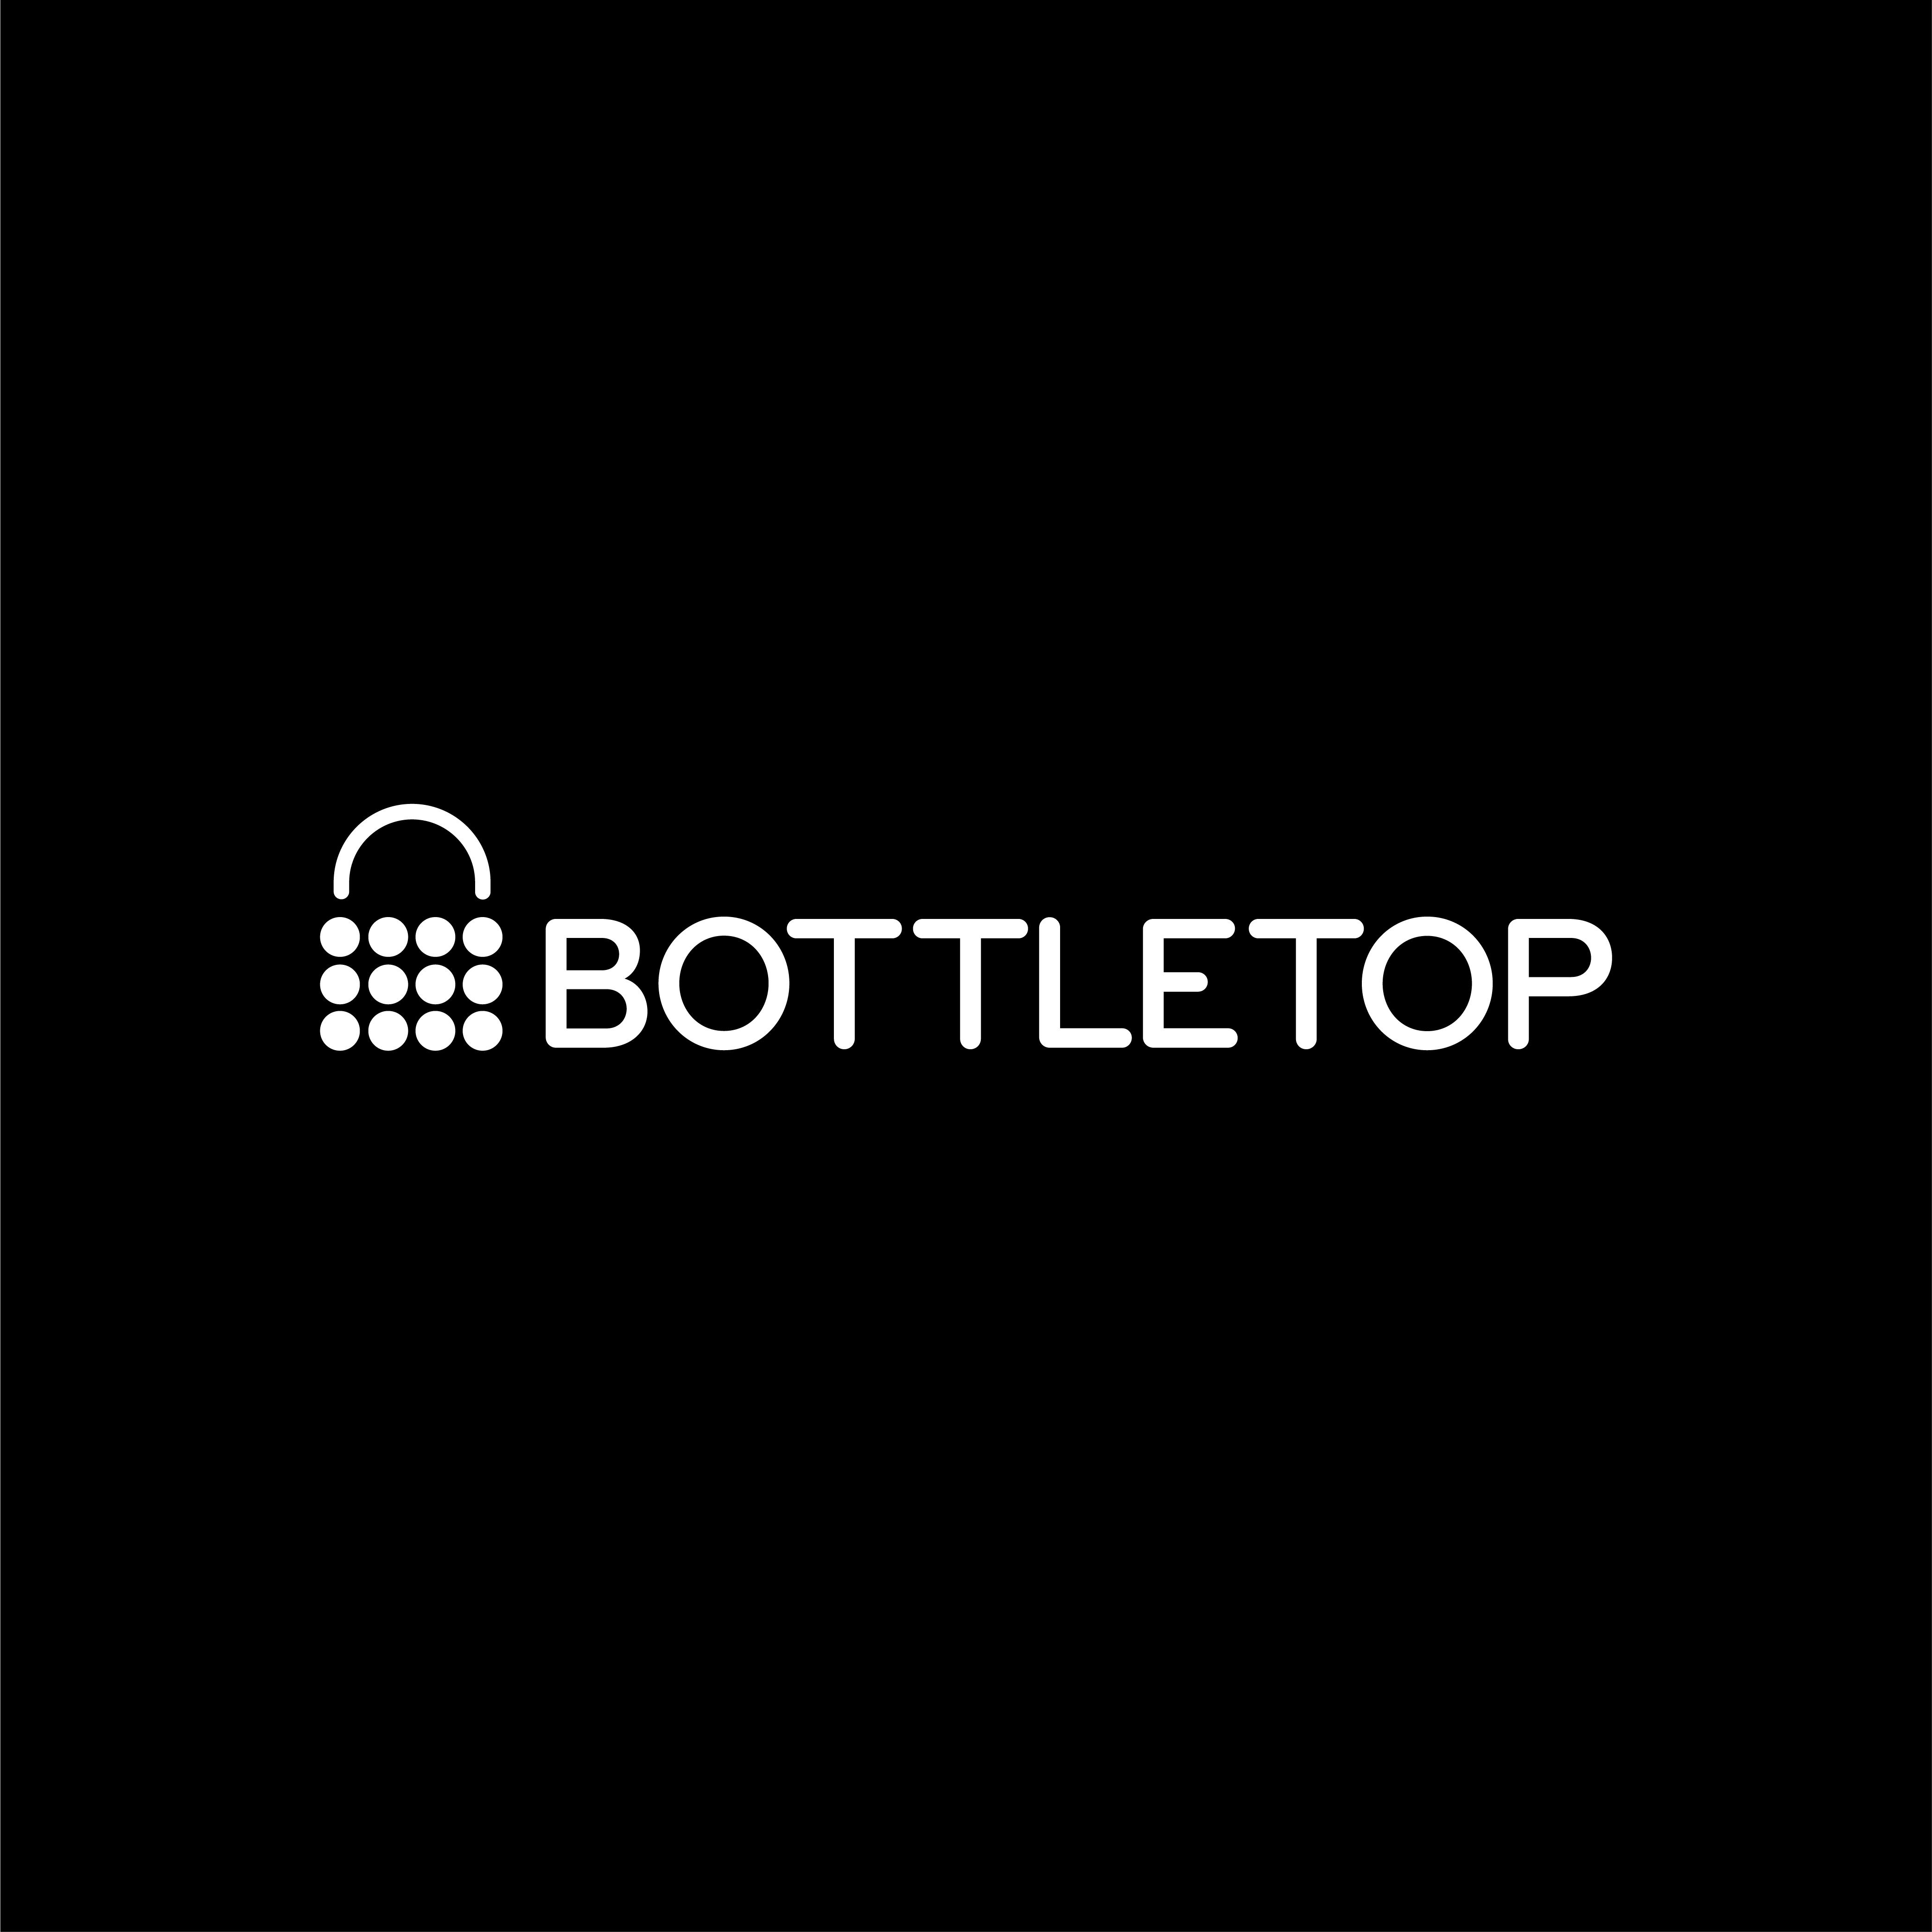 Bottletop